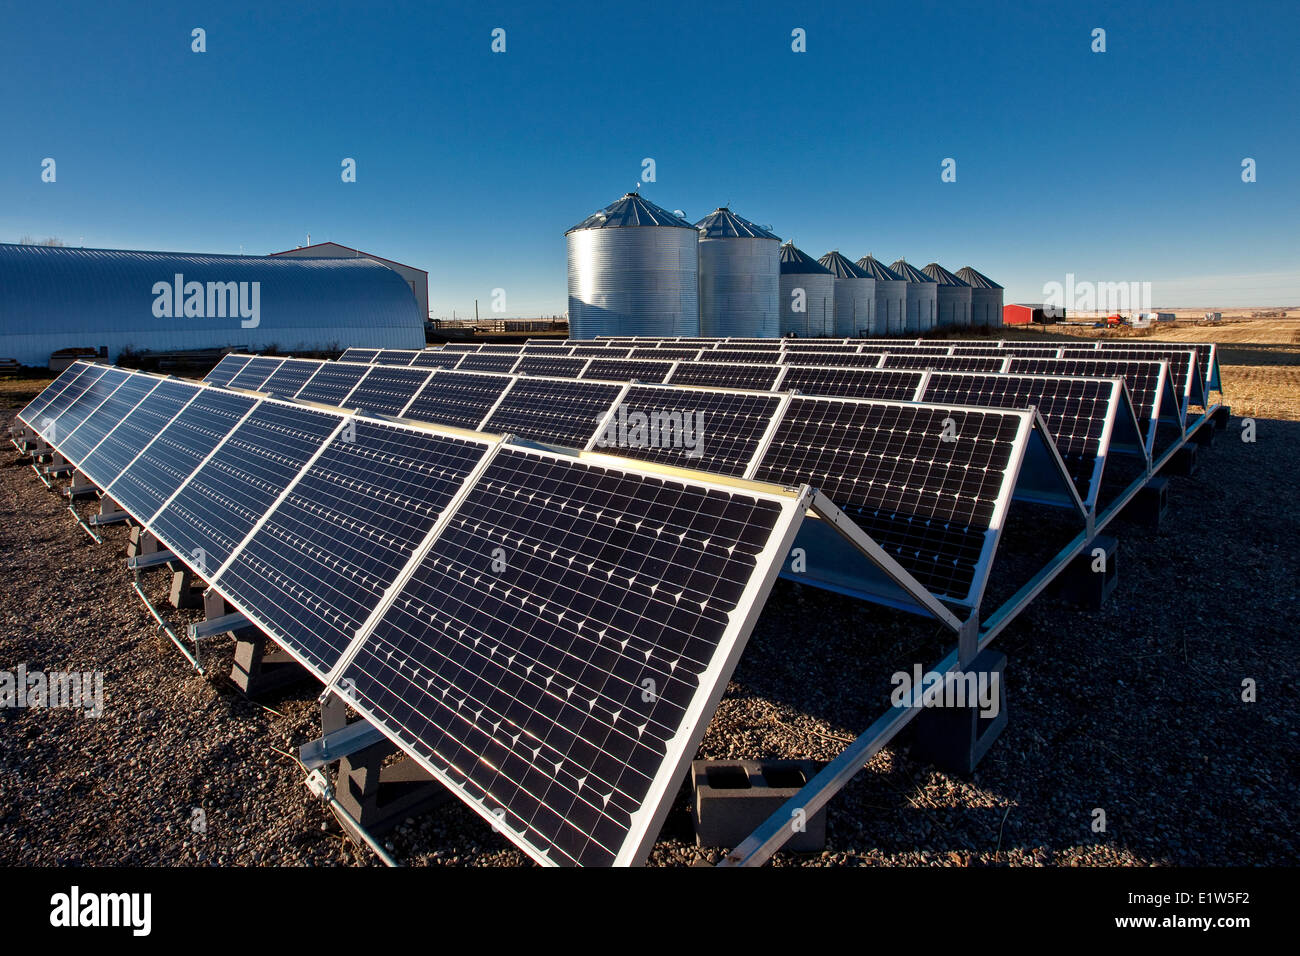 Sonnenkollektoren auf Bauernhof in der Nähe von Calgary, Alberta, Kanada. Stockbild